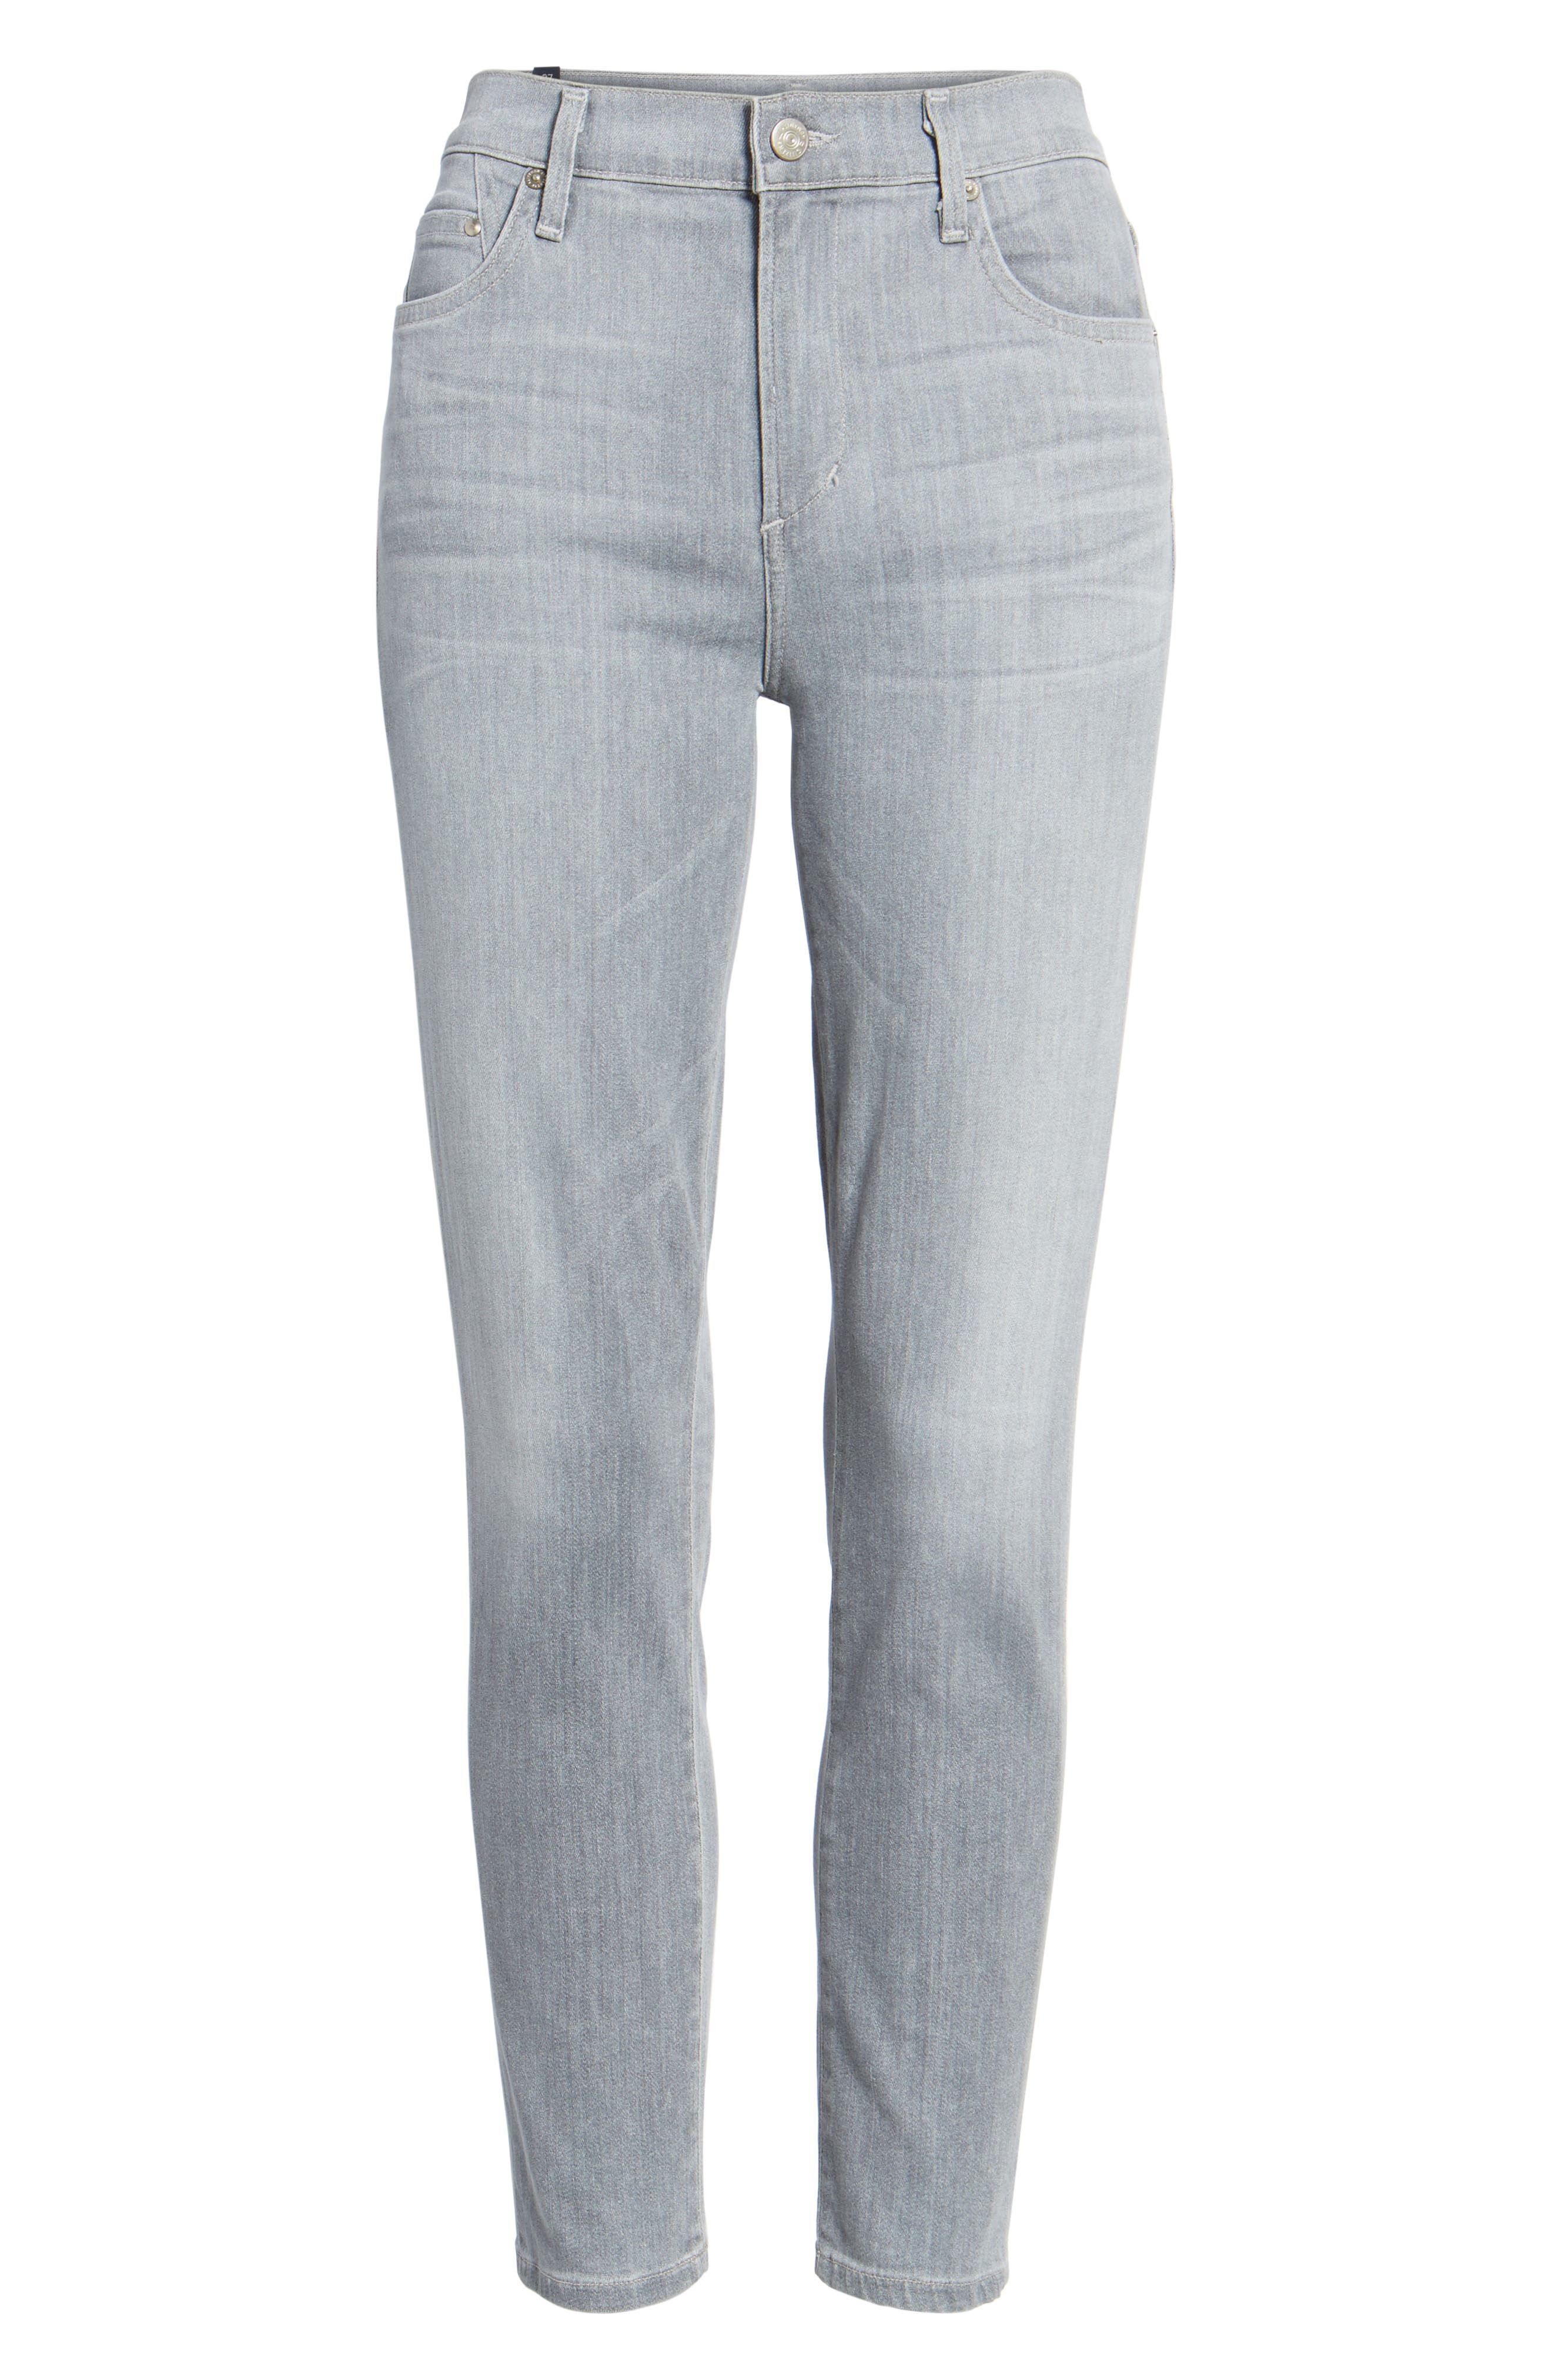 Rocket High Waist Crop Skinny Jeans,                             Alternate thumbnail 7, color,                             Rapture